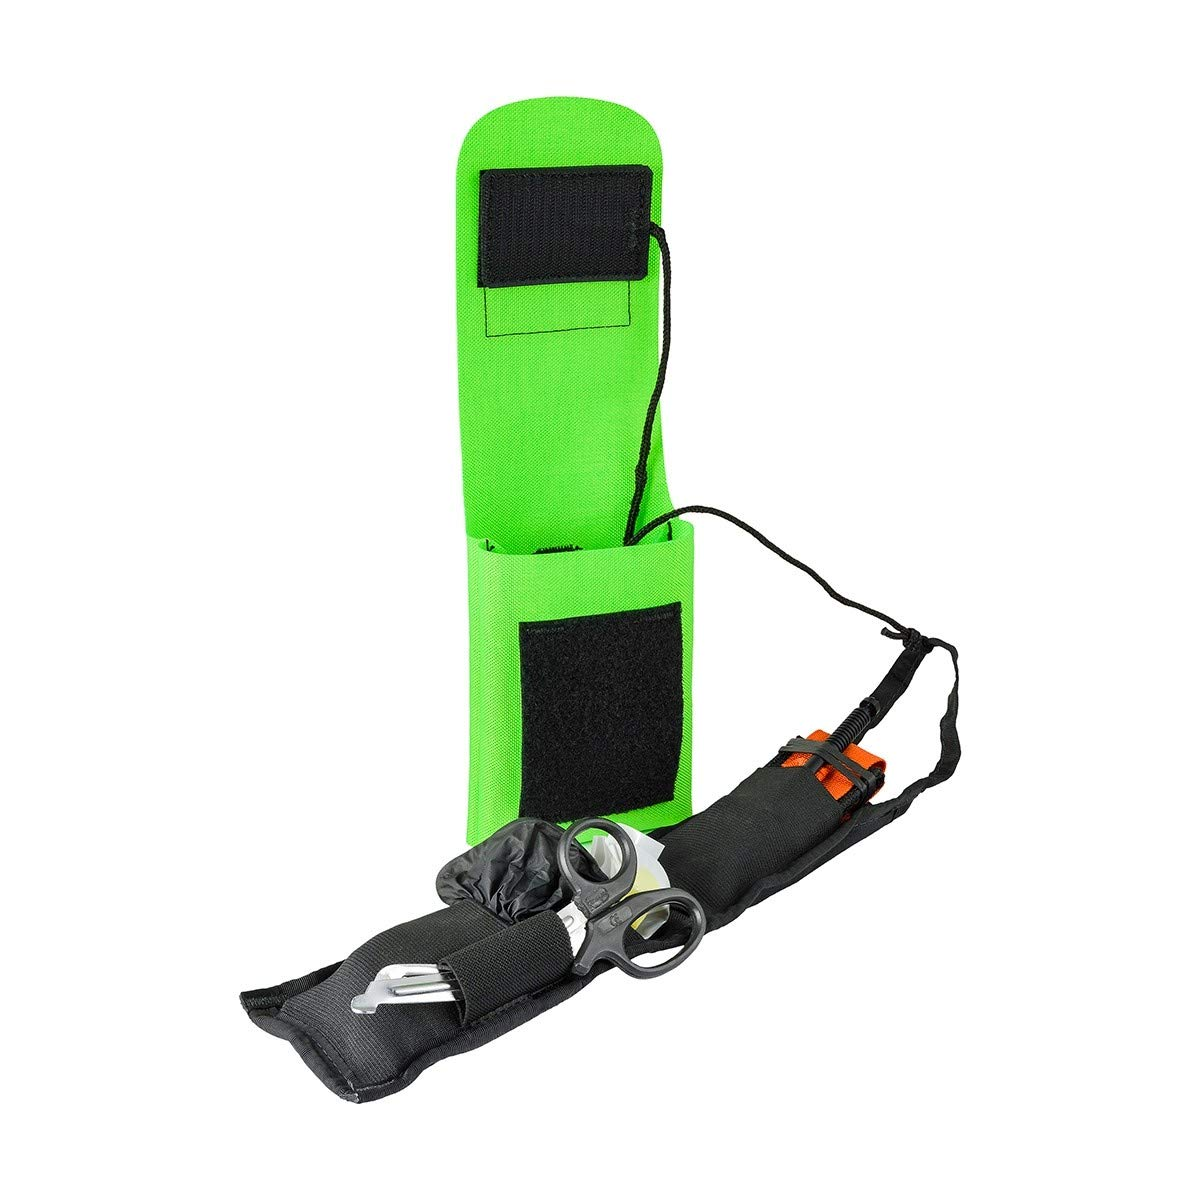 SherrillTree Arborist Medical Kit - Basic Version - Neon Green